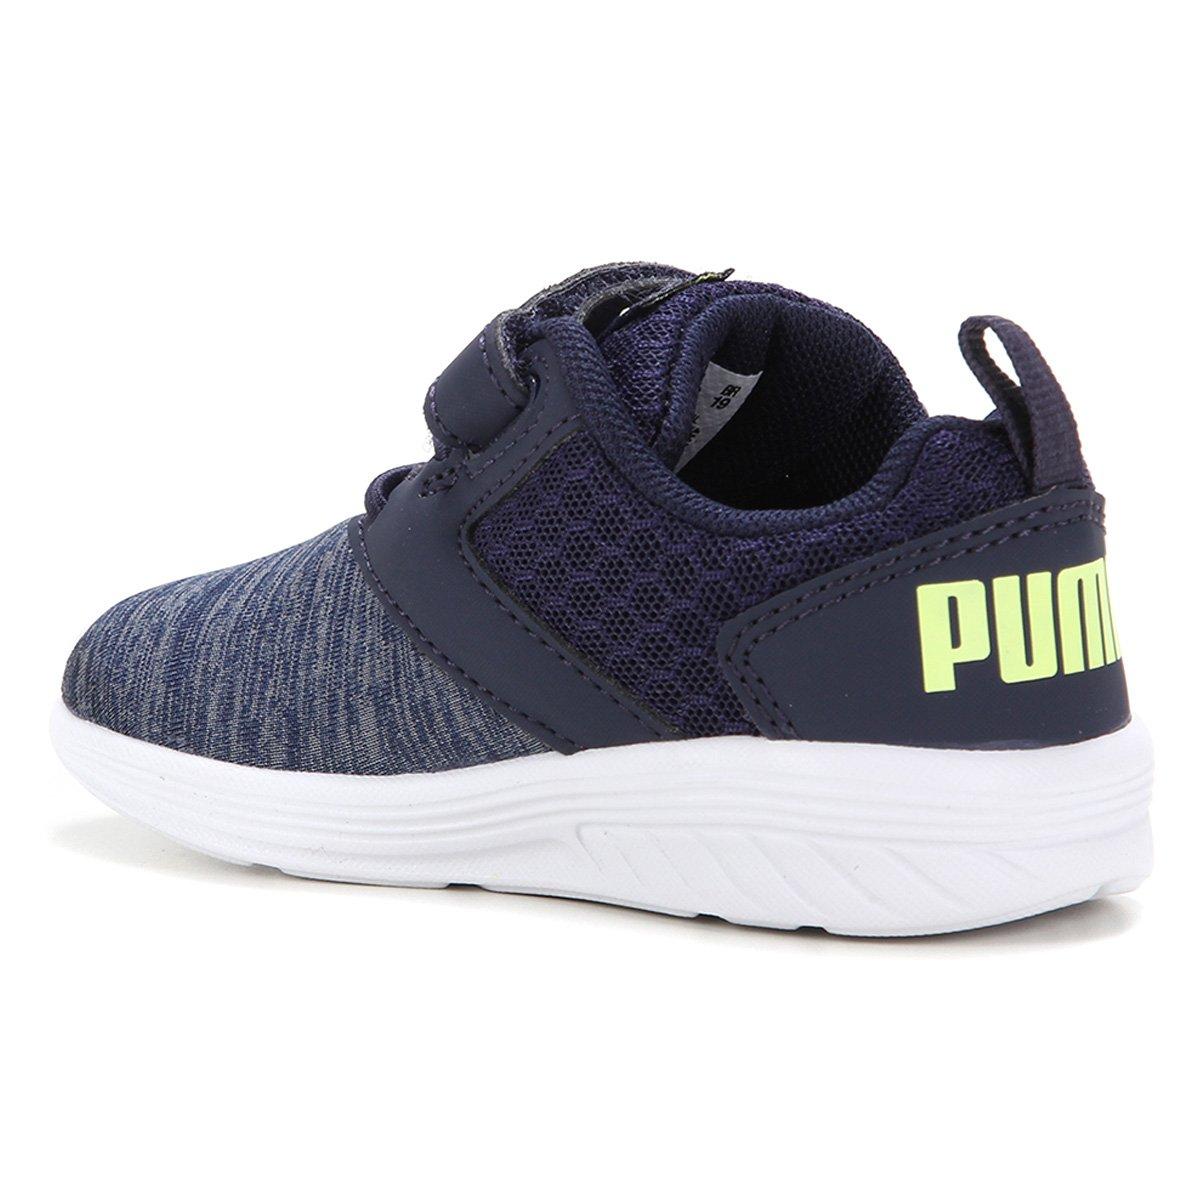 Tenis Puma Azul Masculino Nrgy Comet